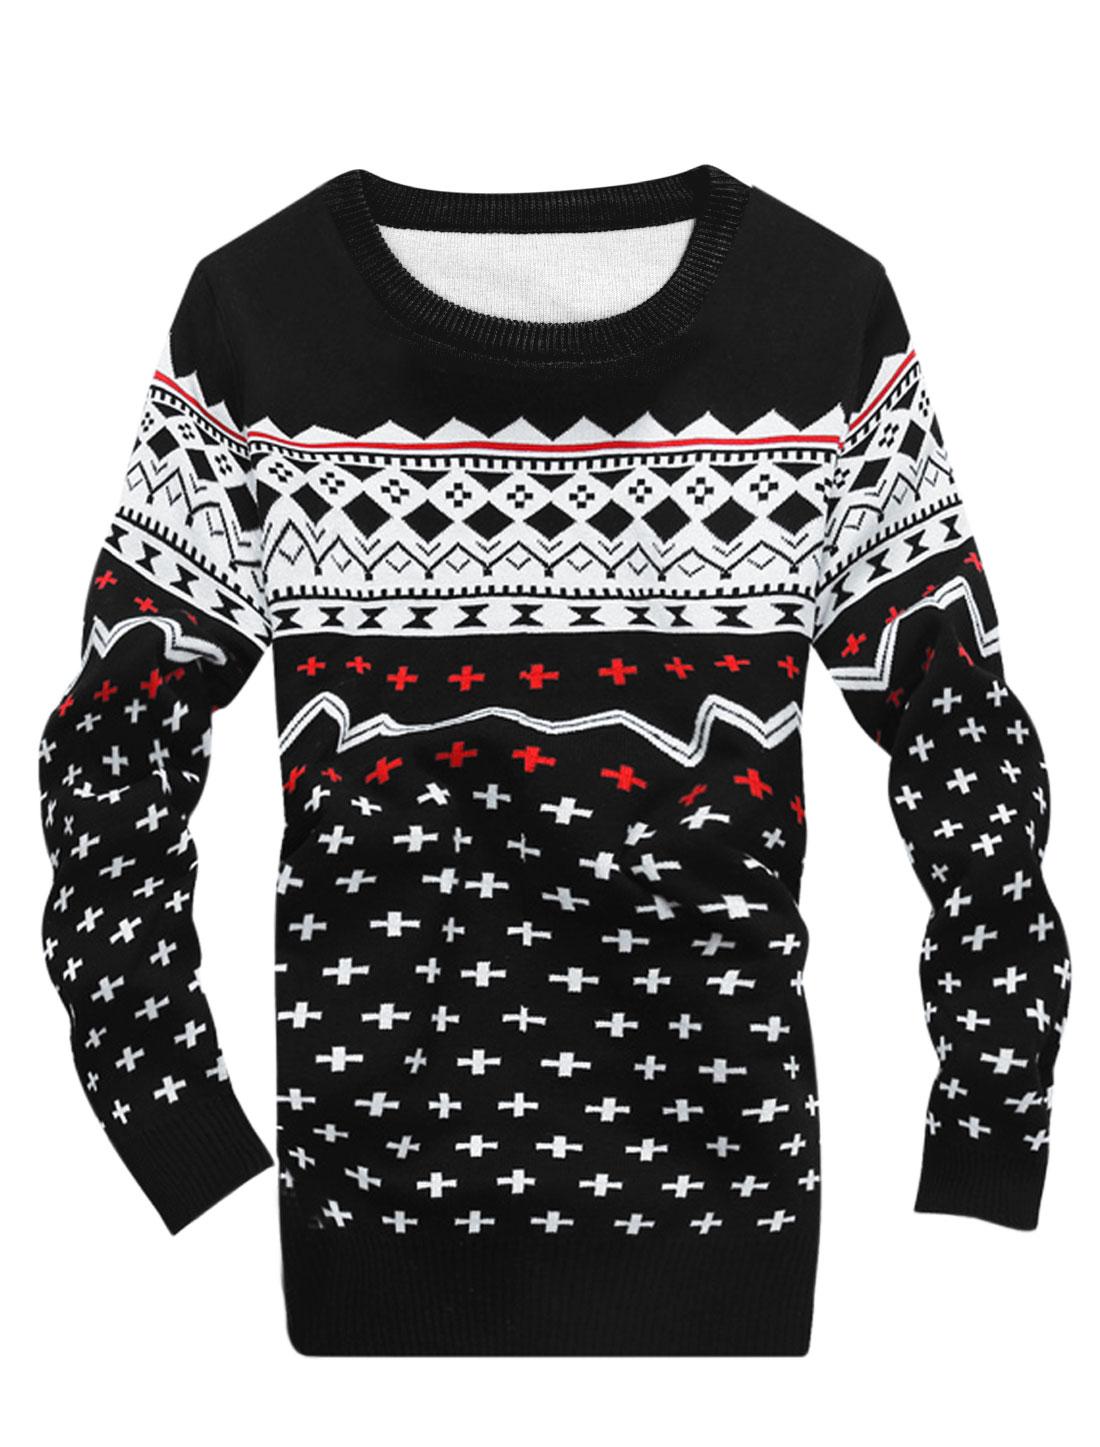 Men Geometric Pattern Long Sleeves Crew Neck Sweater Black S